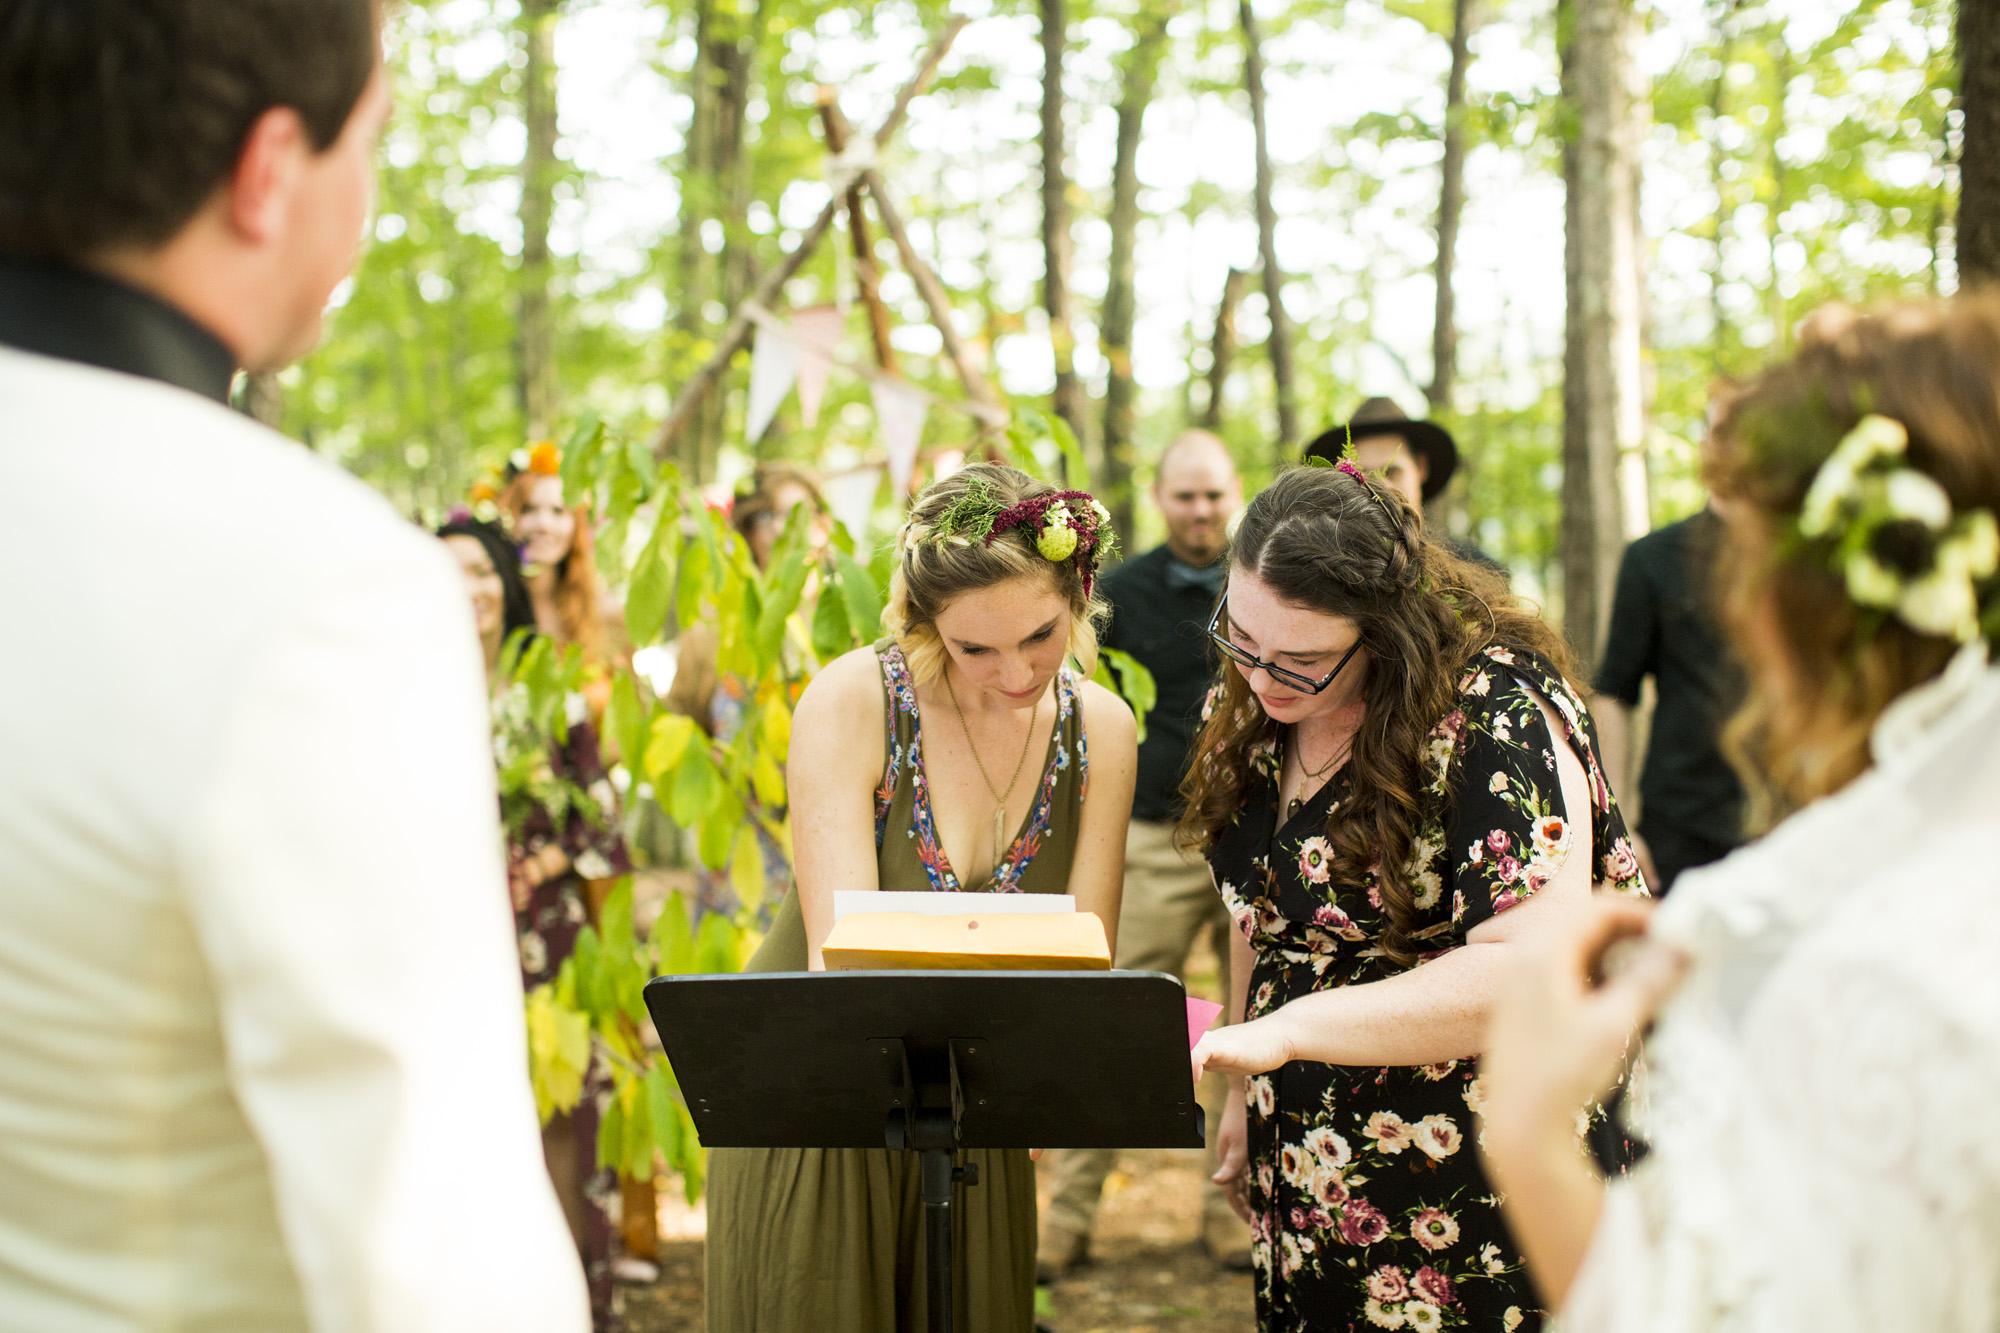 Seriously_Sabrina_Photography_Red_River_Gorge_Kentucky_Wedding_ShawnDana132.jpg